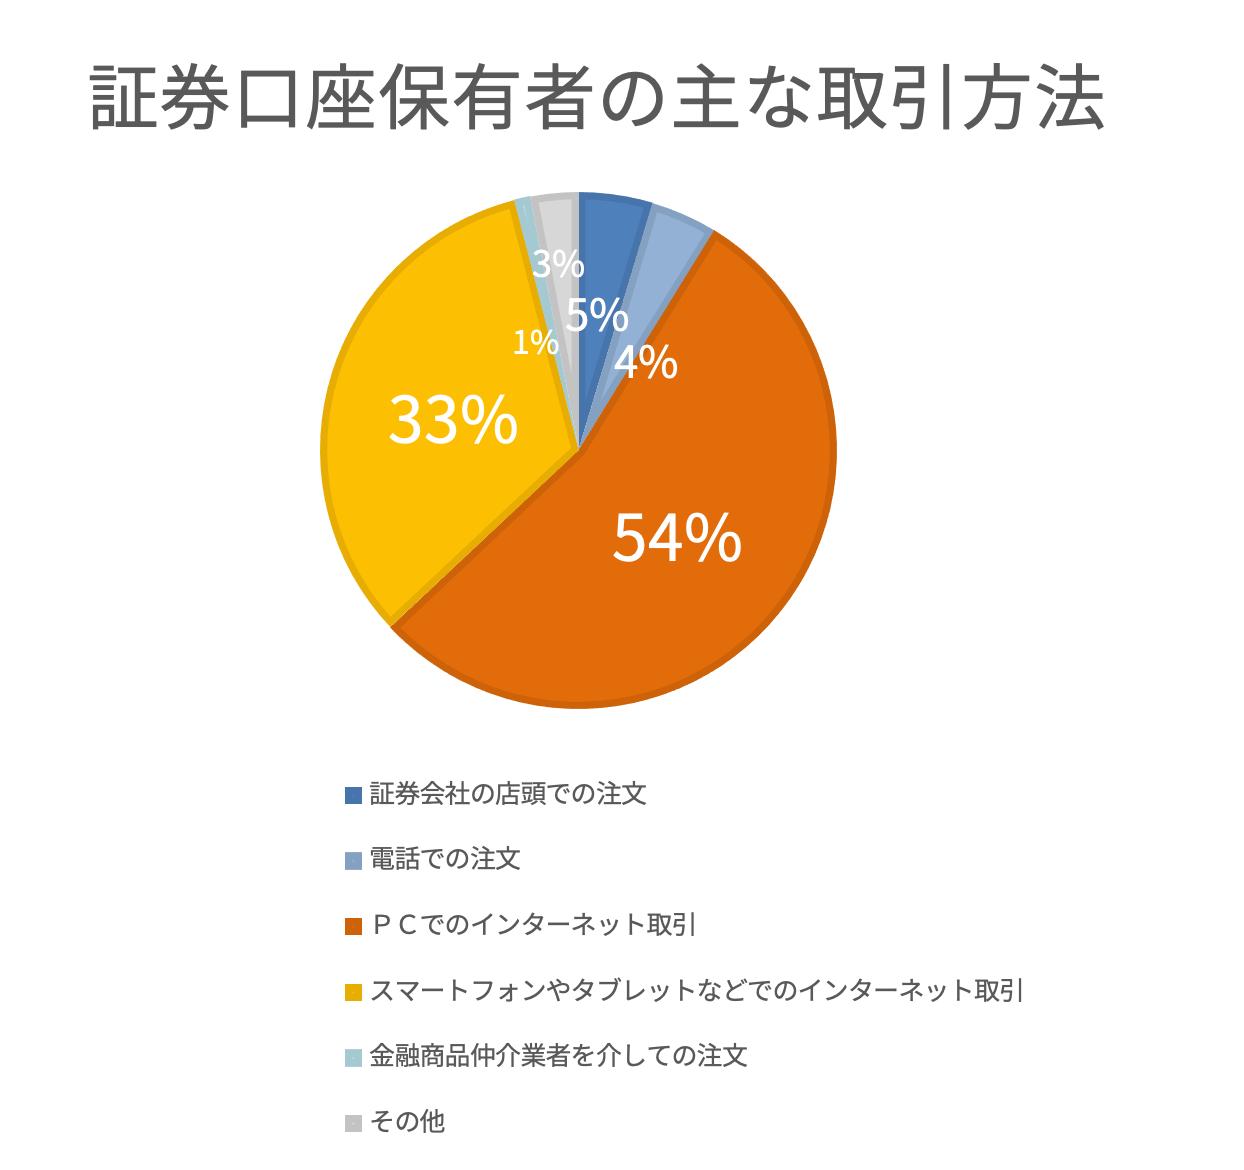 証券会社の取引方法調査結果